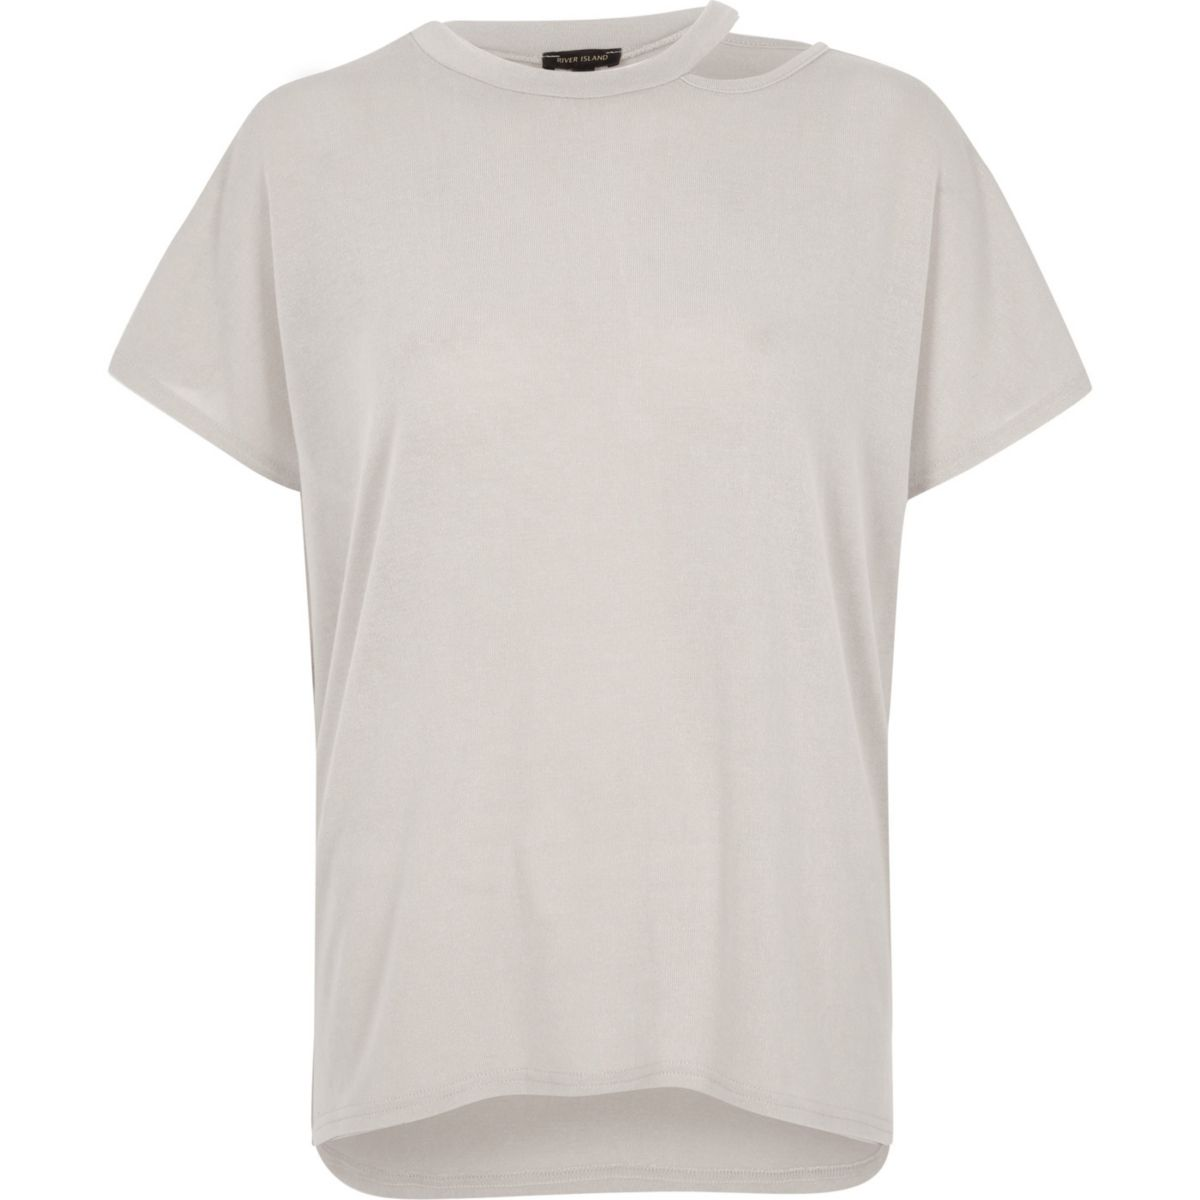 Light grey knit cut out neck T-shirt